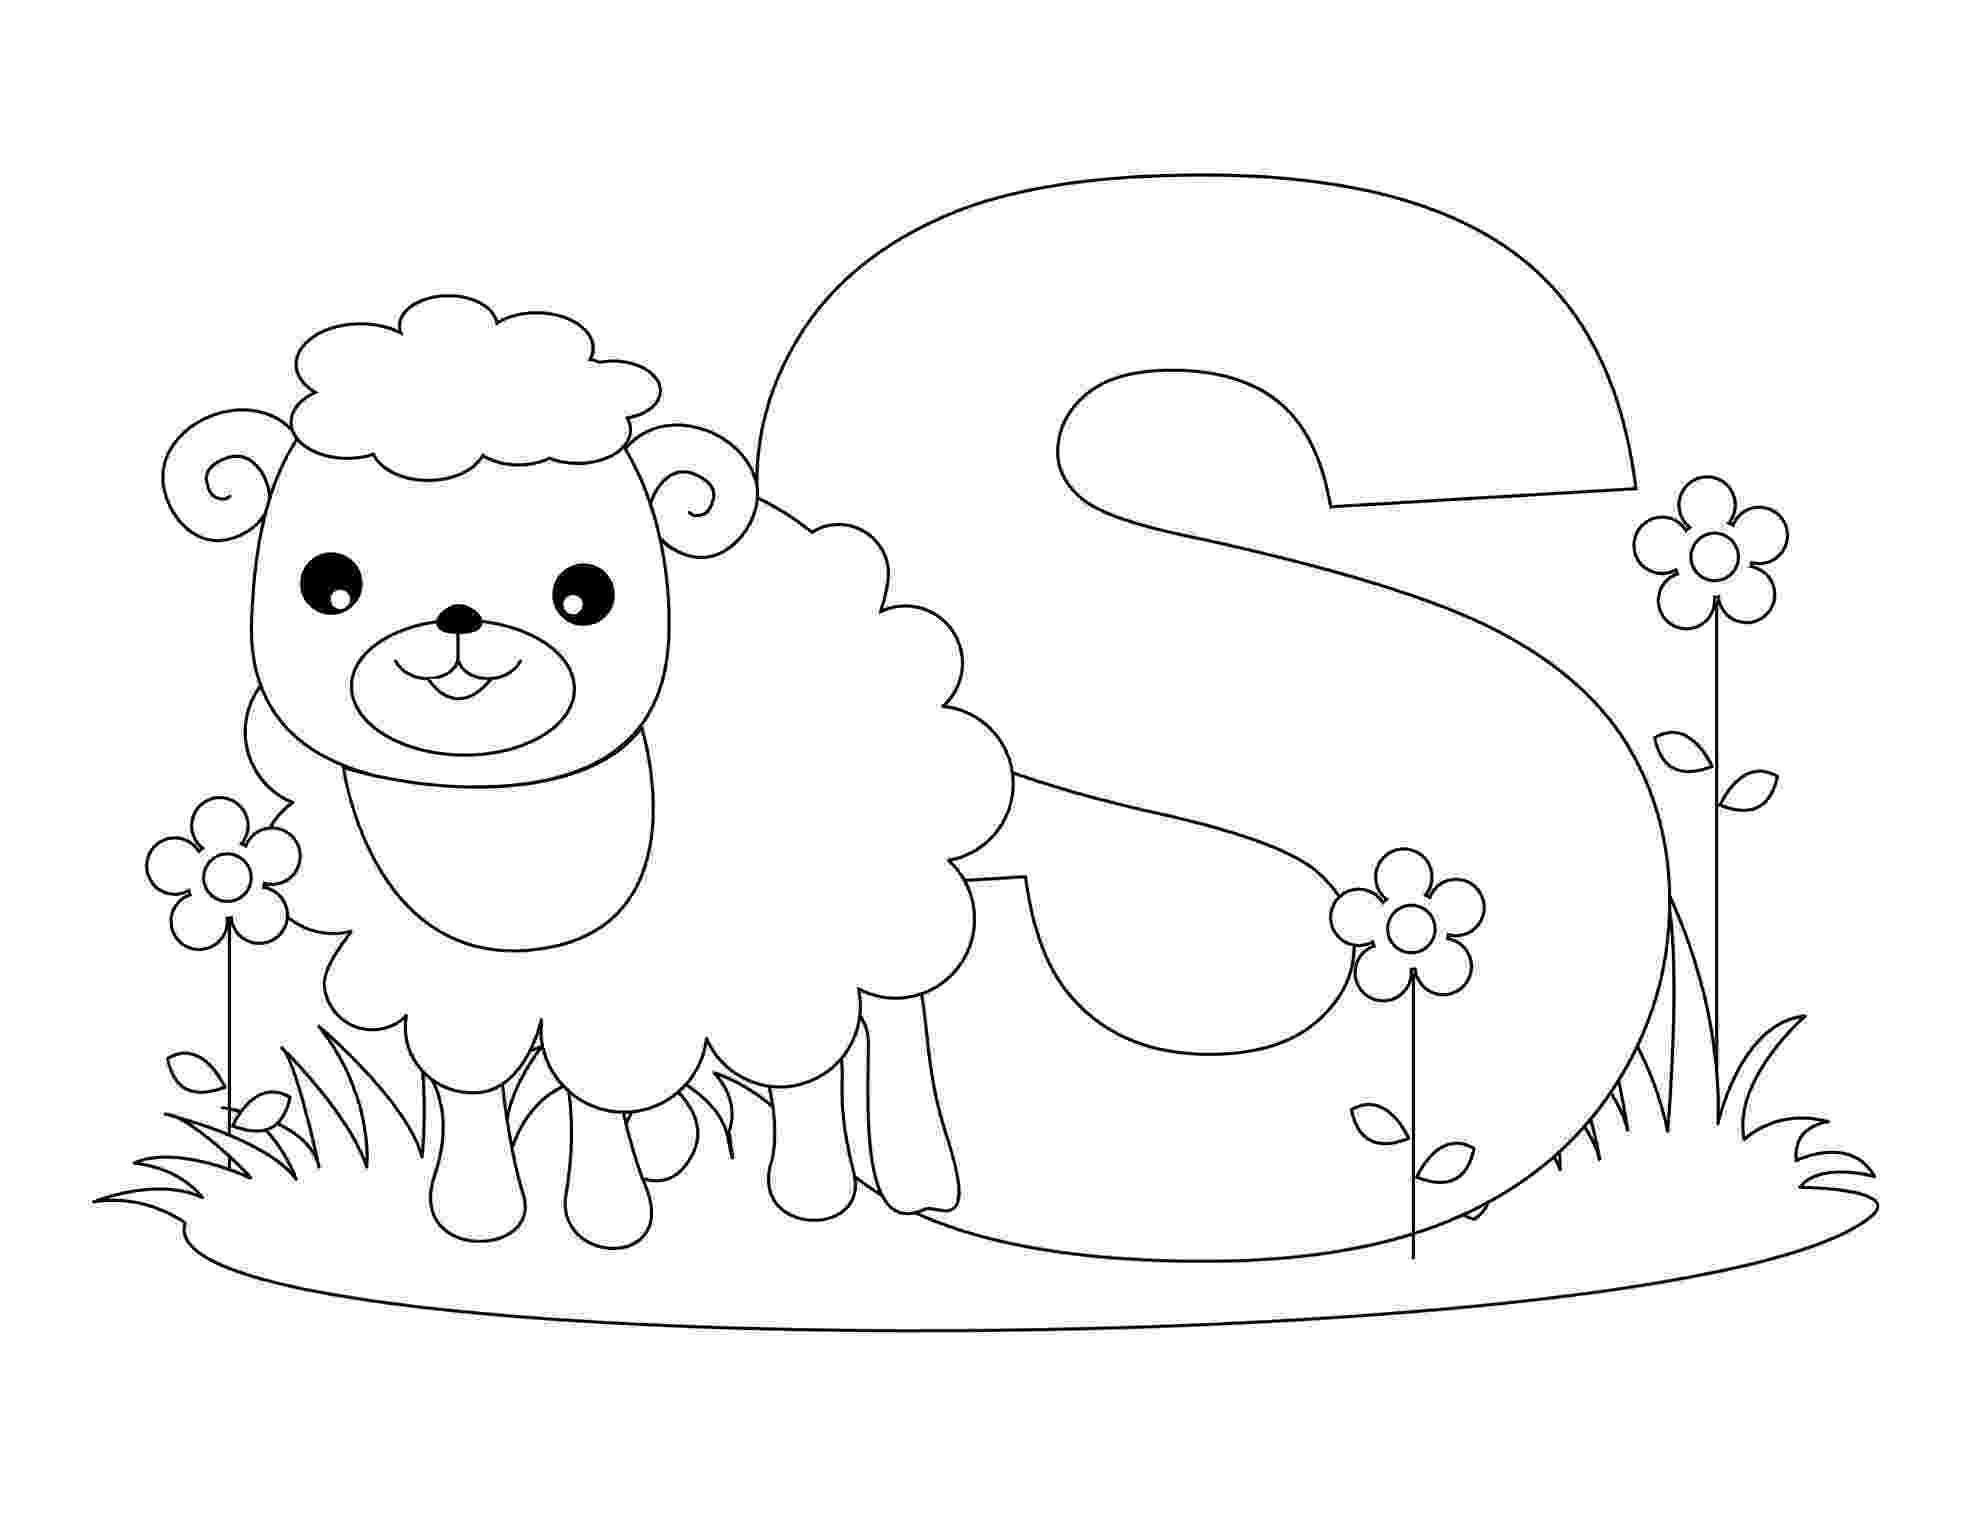 alphabet coloring worksheets free printable alphabet coloring pages for kids best coloring worksheets alphabet 1 1